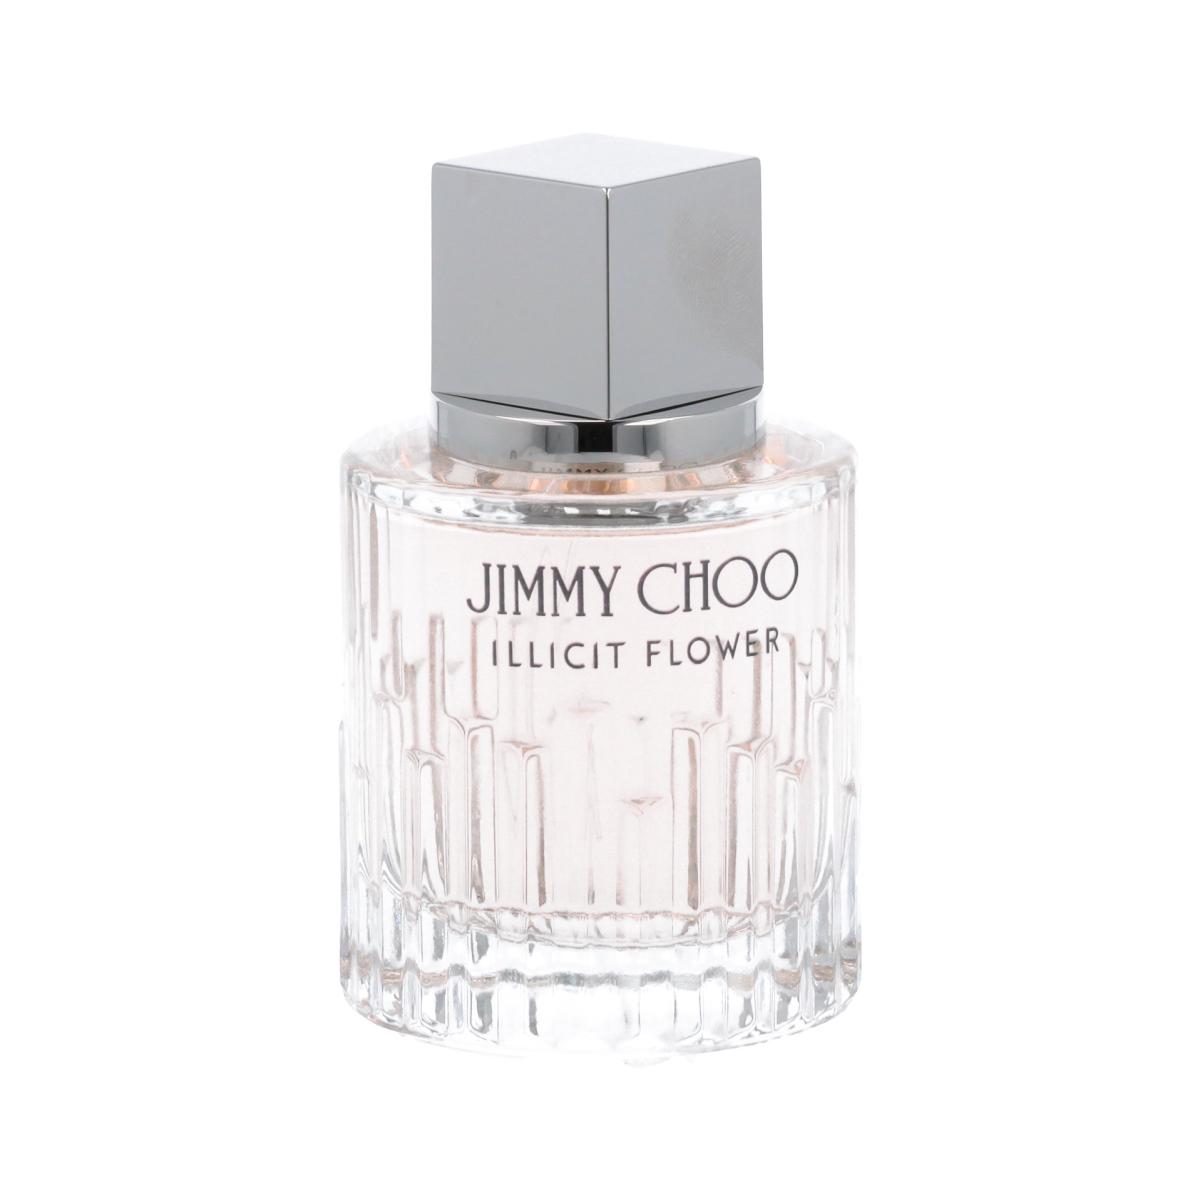 Jimmy Choo Illicit Flower EDT 60 ml W